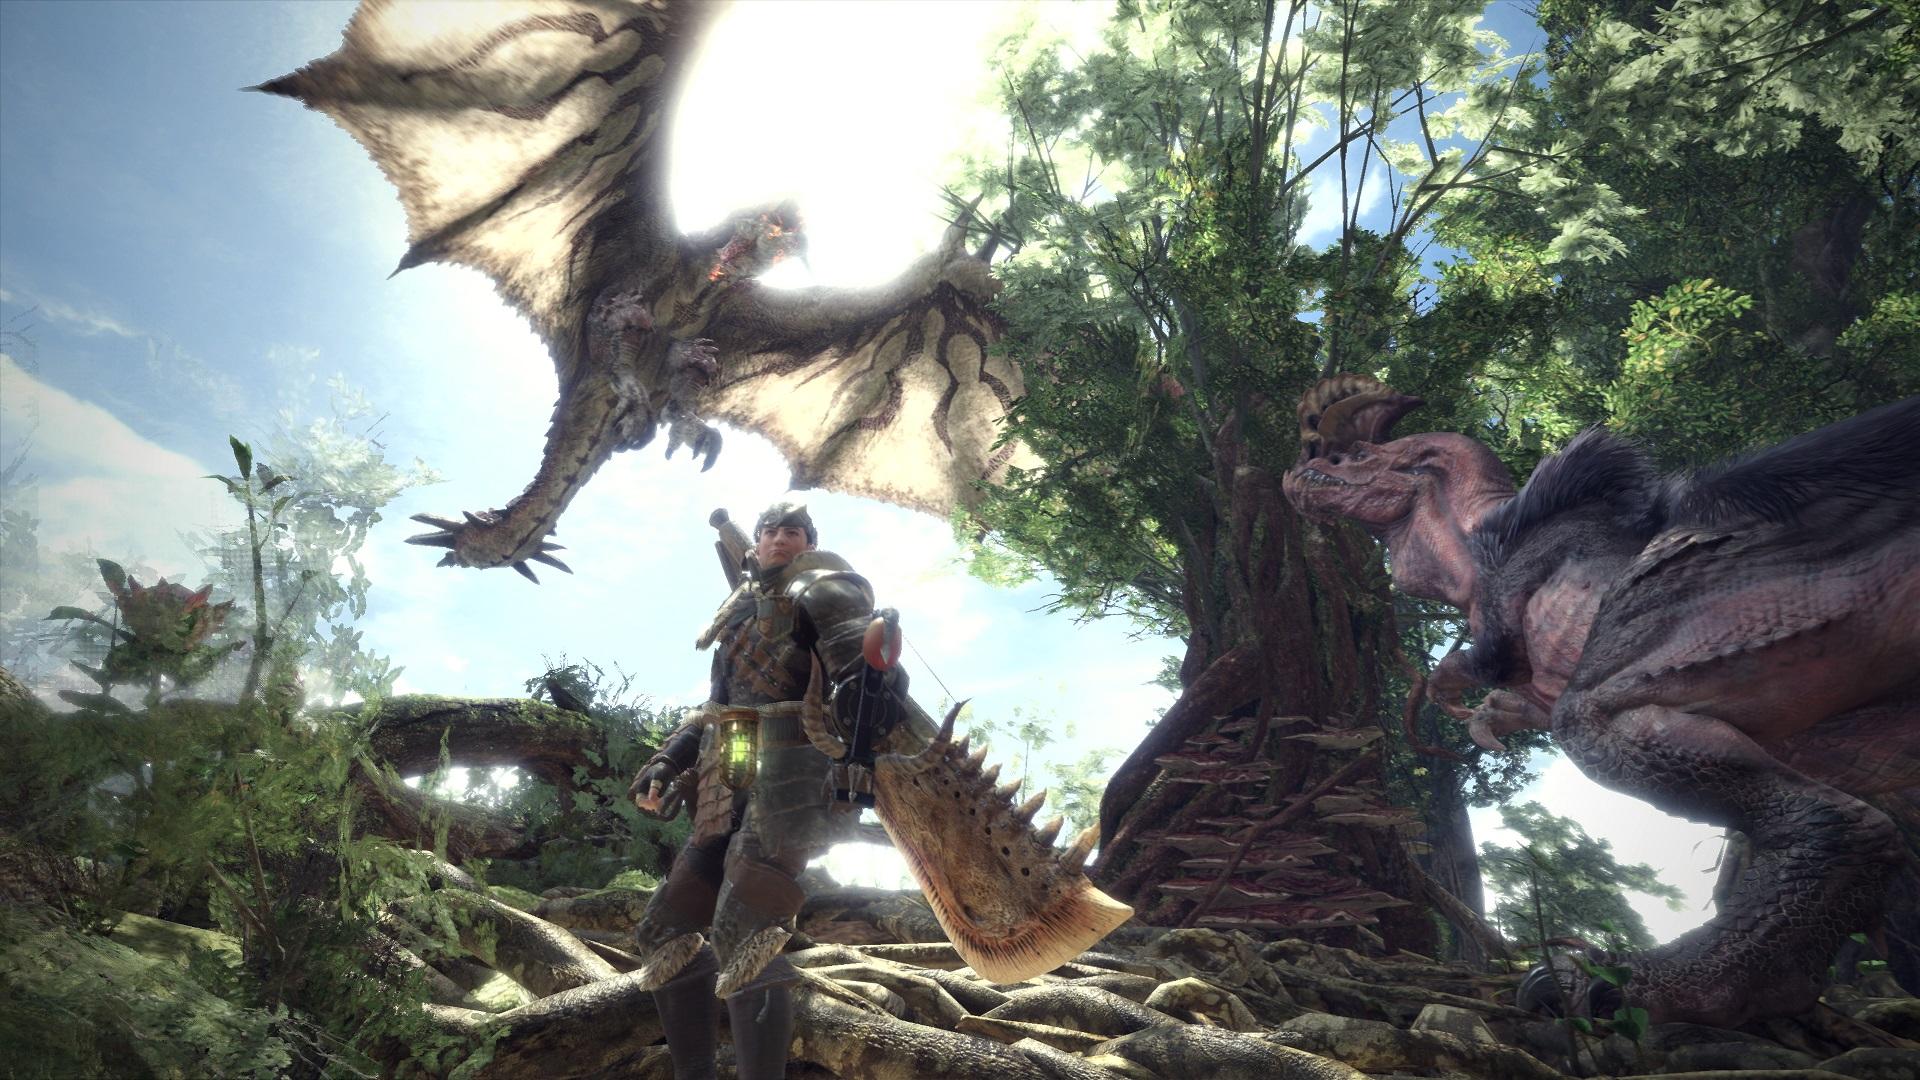 Le prochain Monster Hunter sera aussi sur Xbox One